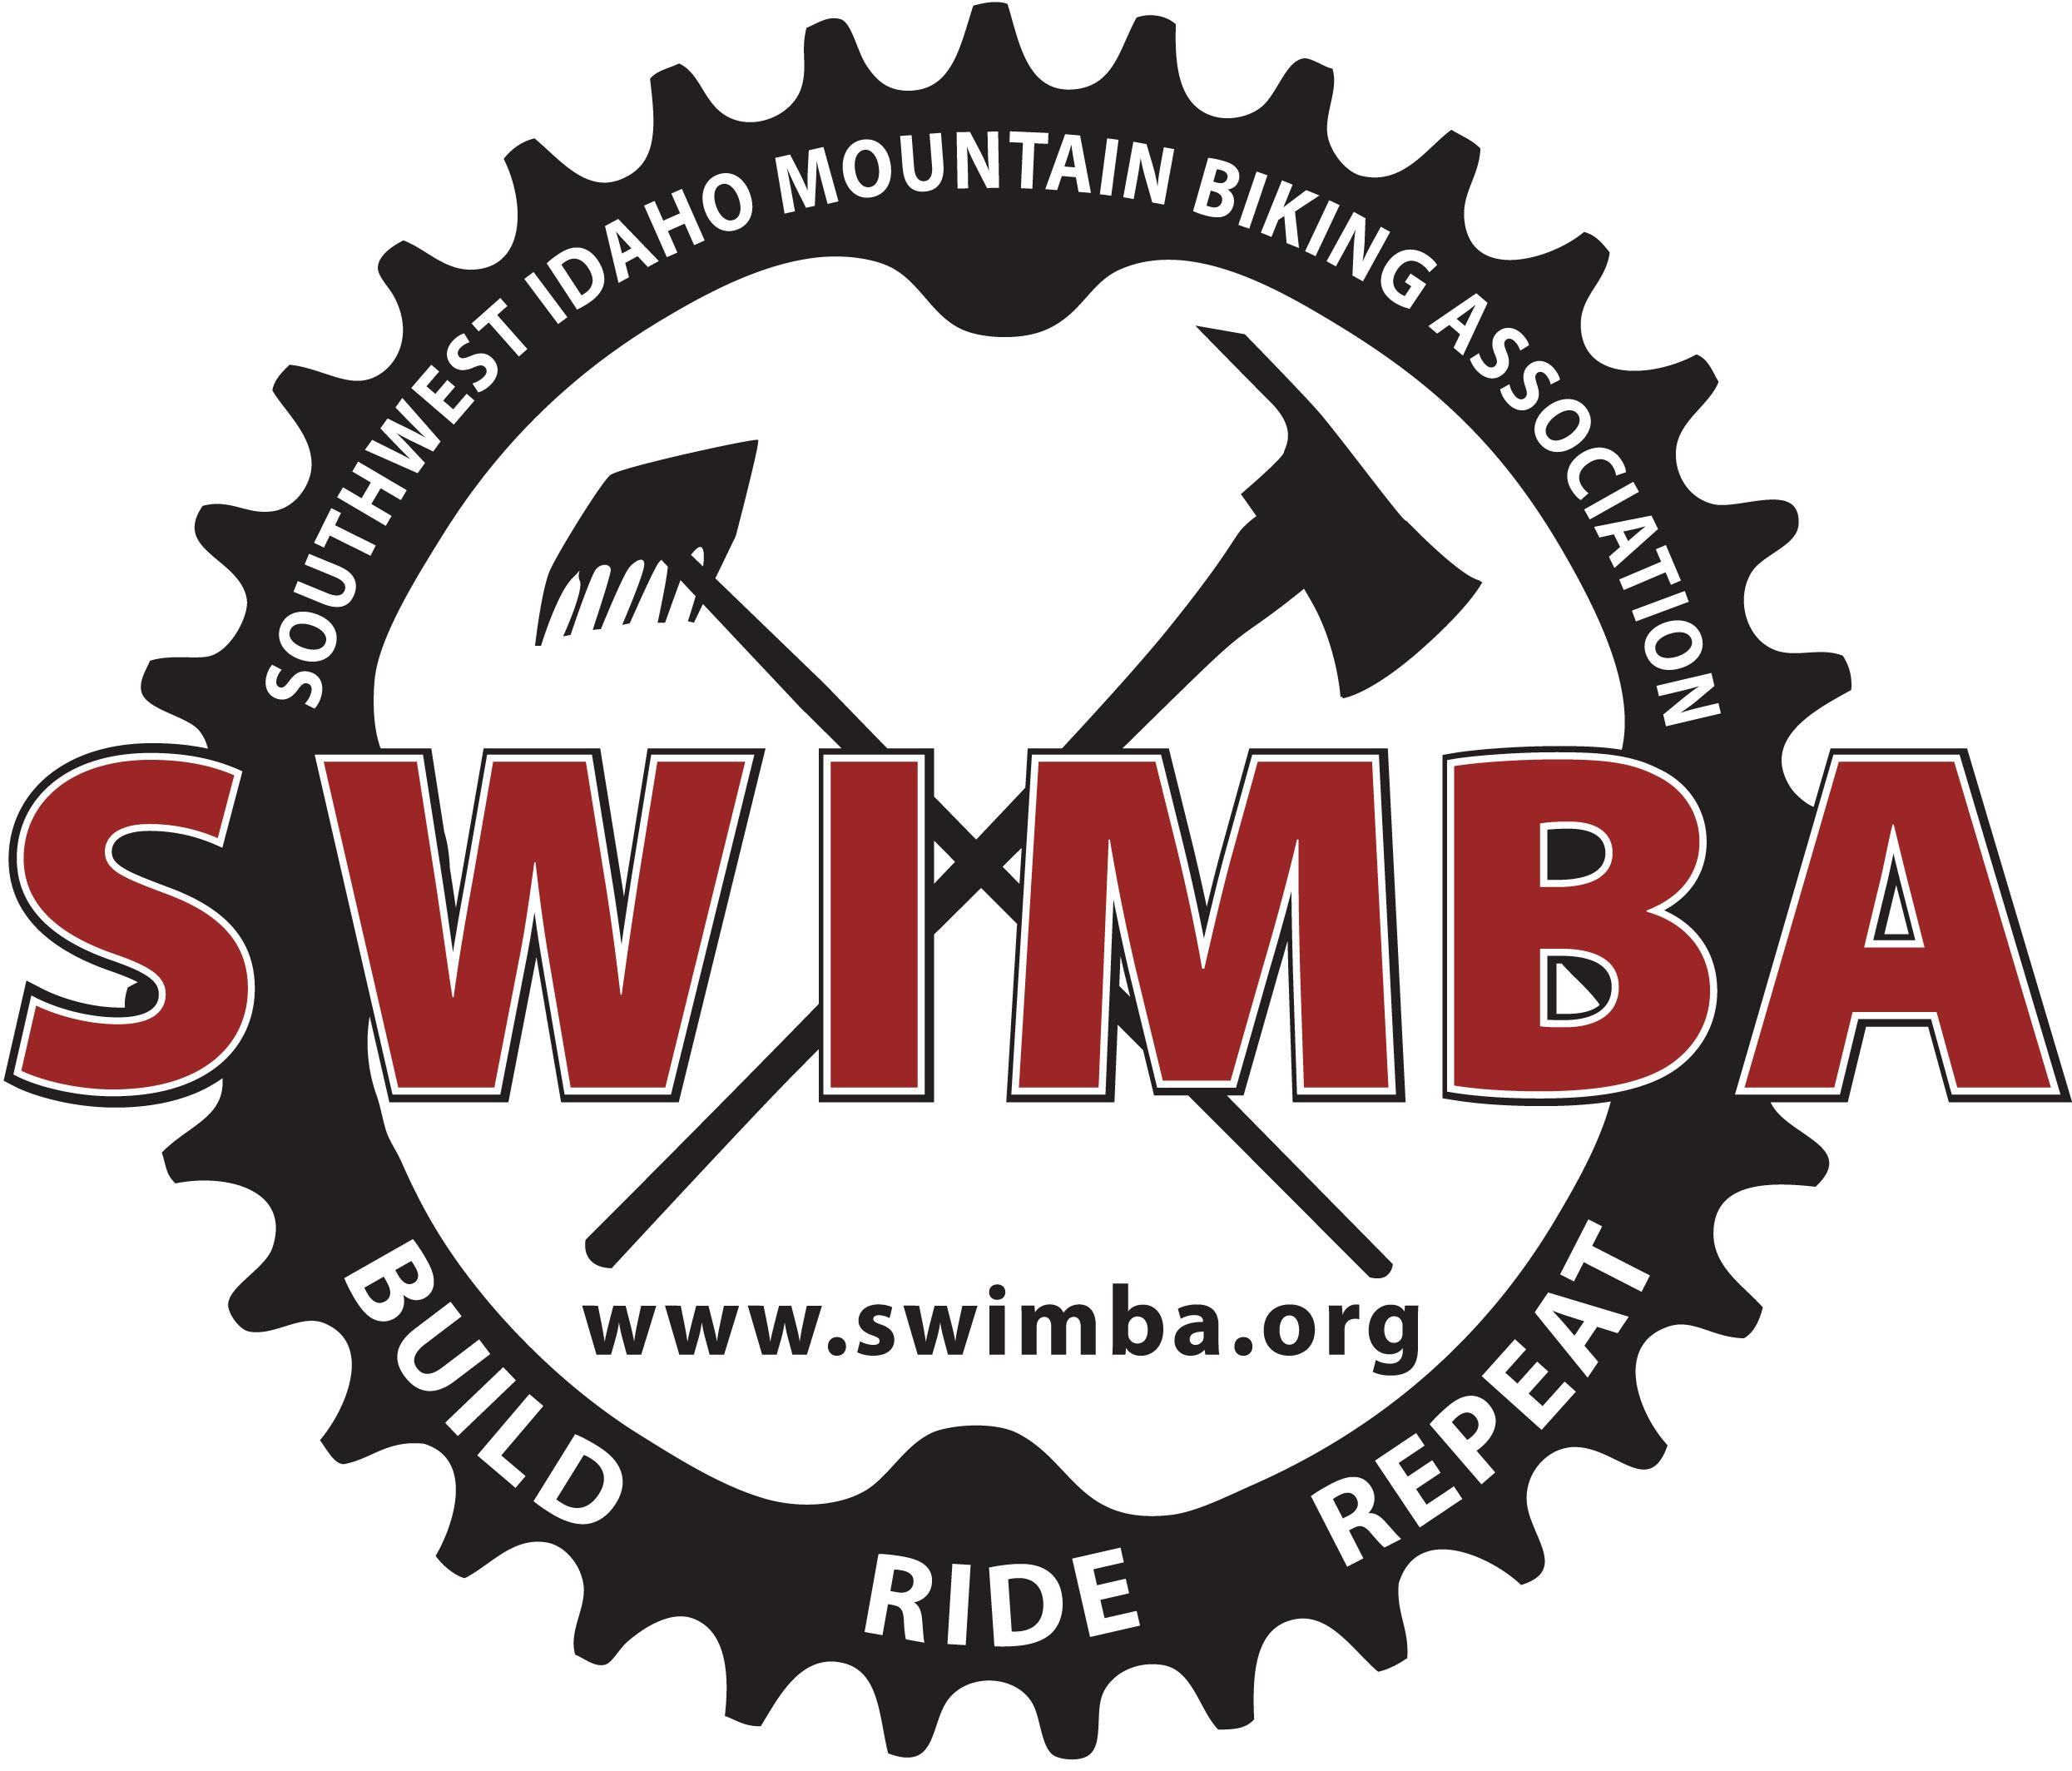 Southwest Idaho Mountain Biking Association